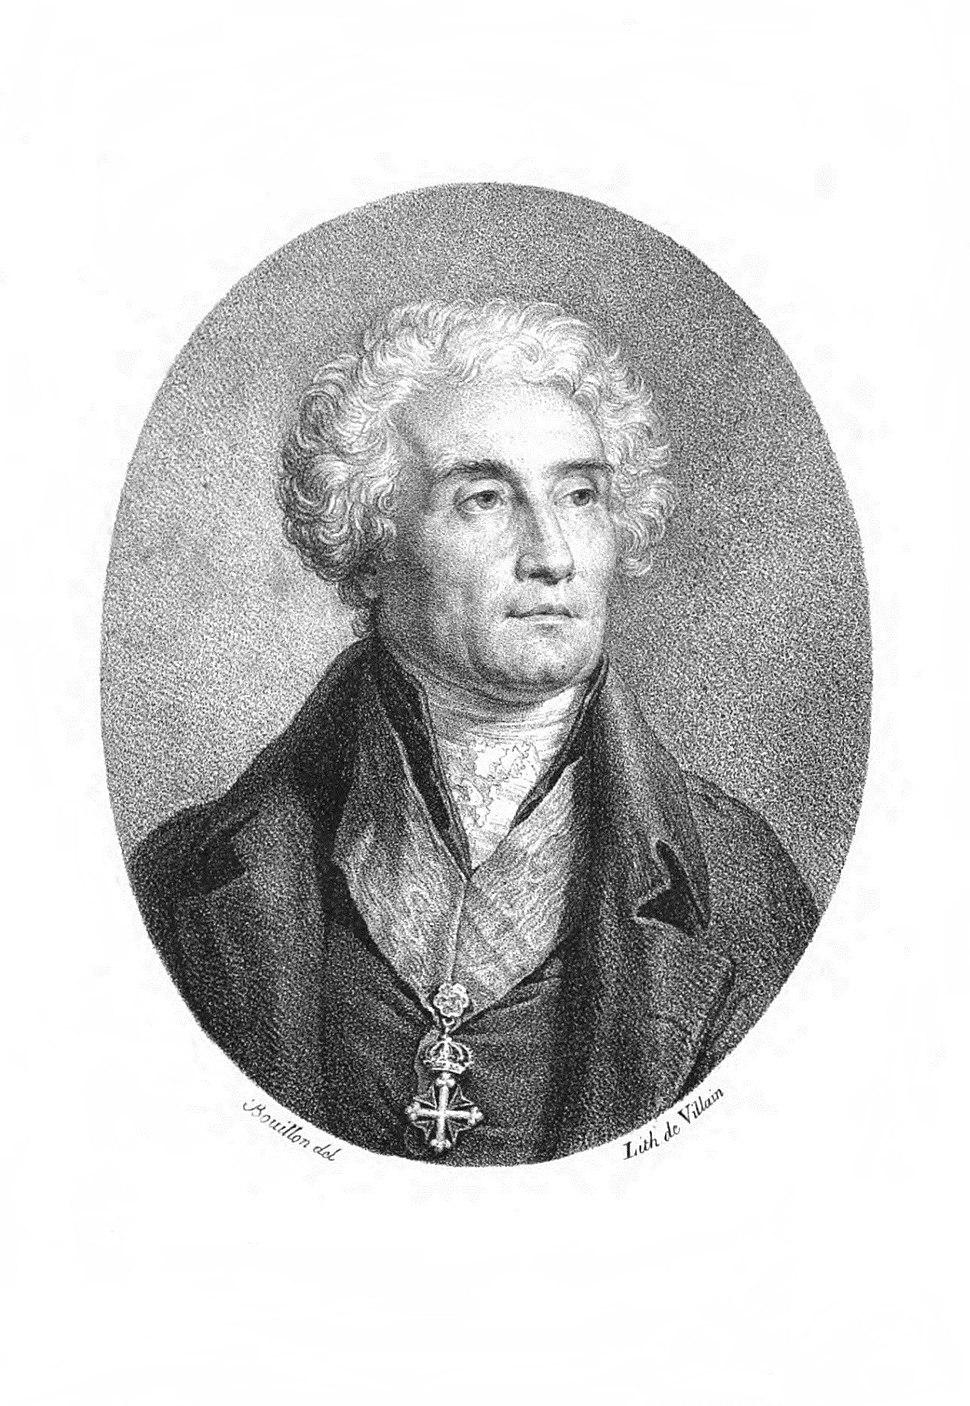 Portrait of Joseph de Maistre